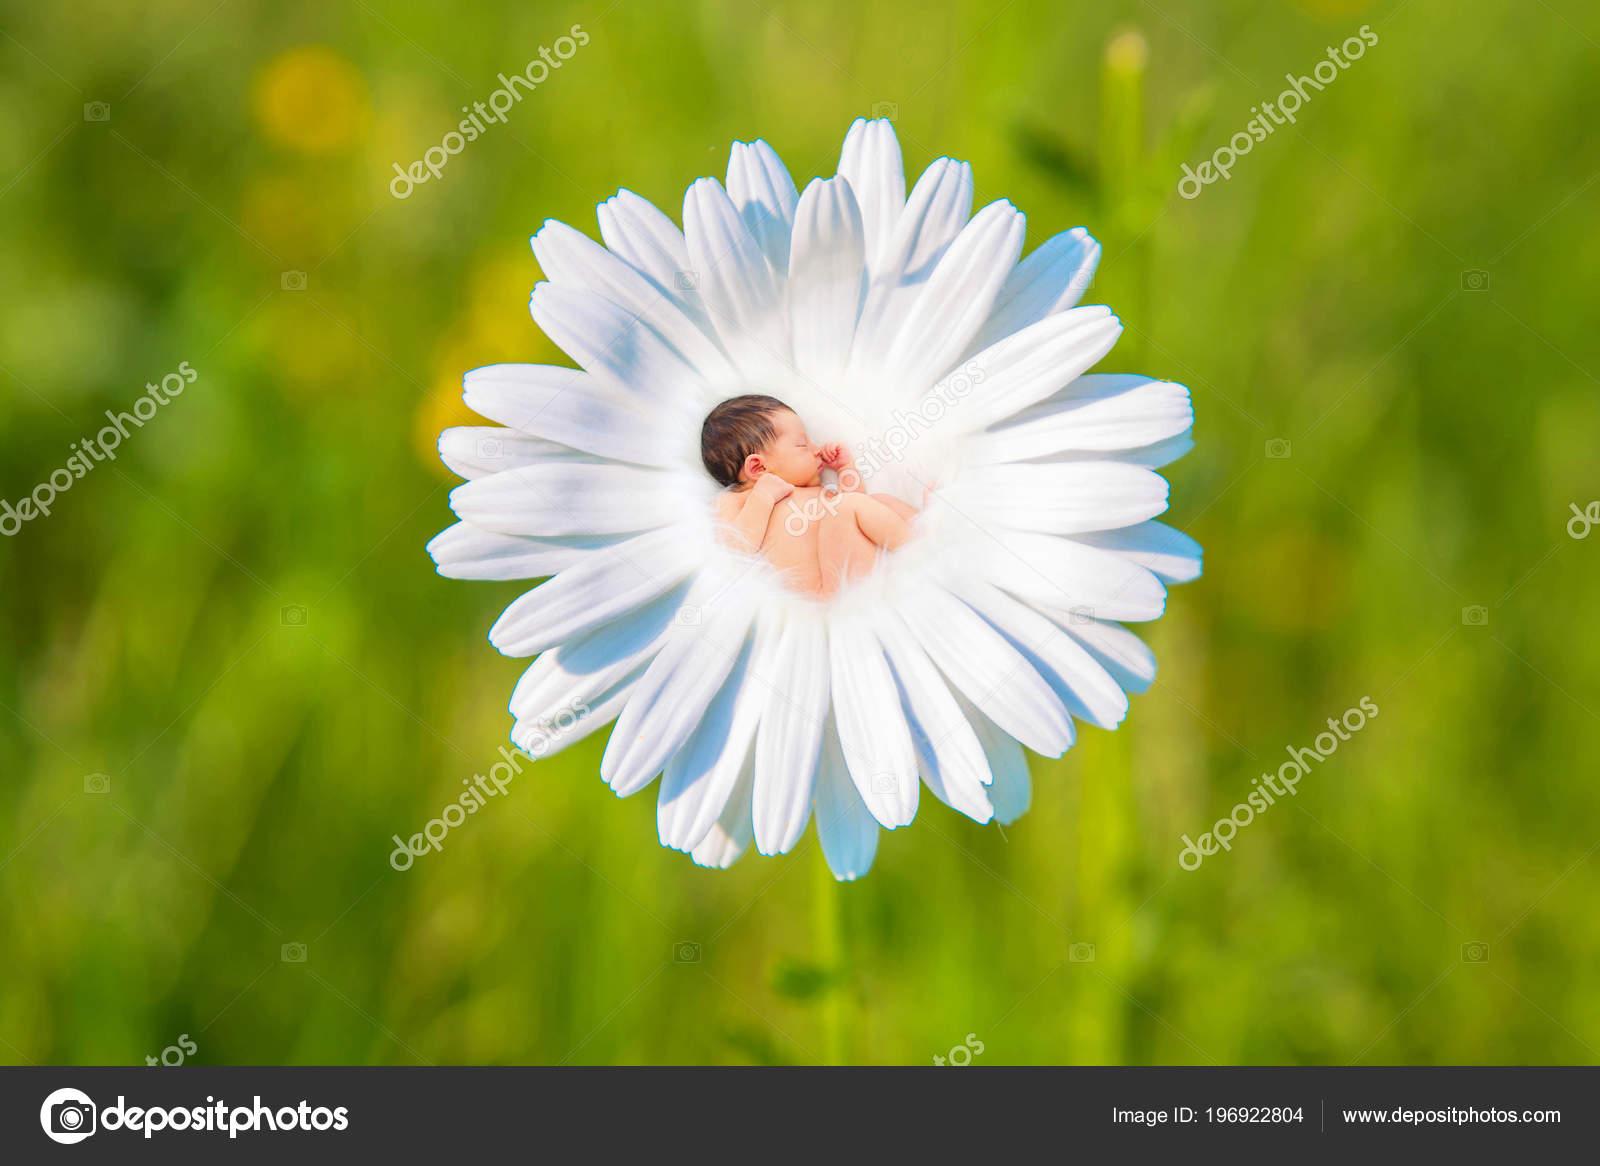 Newborn Baby Sleeps White Daisy Flower Newborn Baby Sleeps Meadow